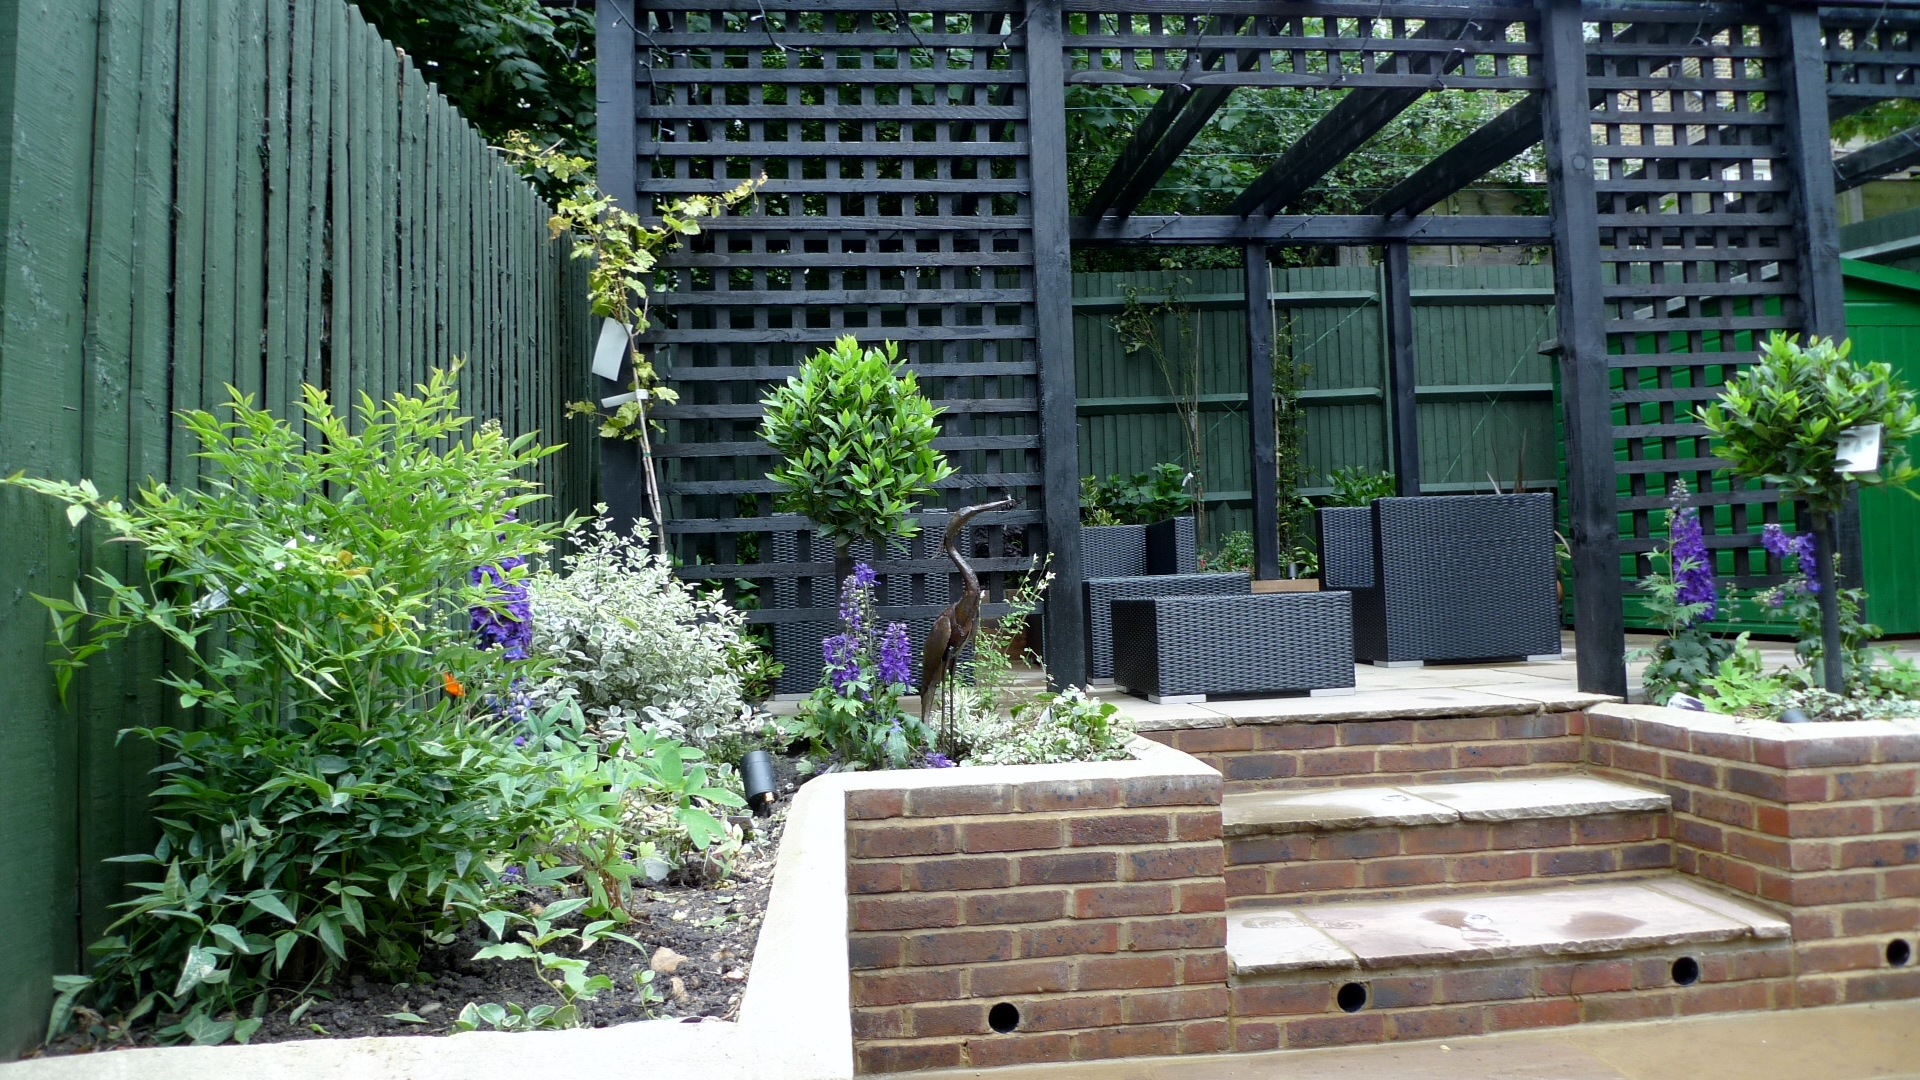 Project wood working victorian arbor plans for Victorian garden walls designs